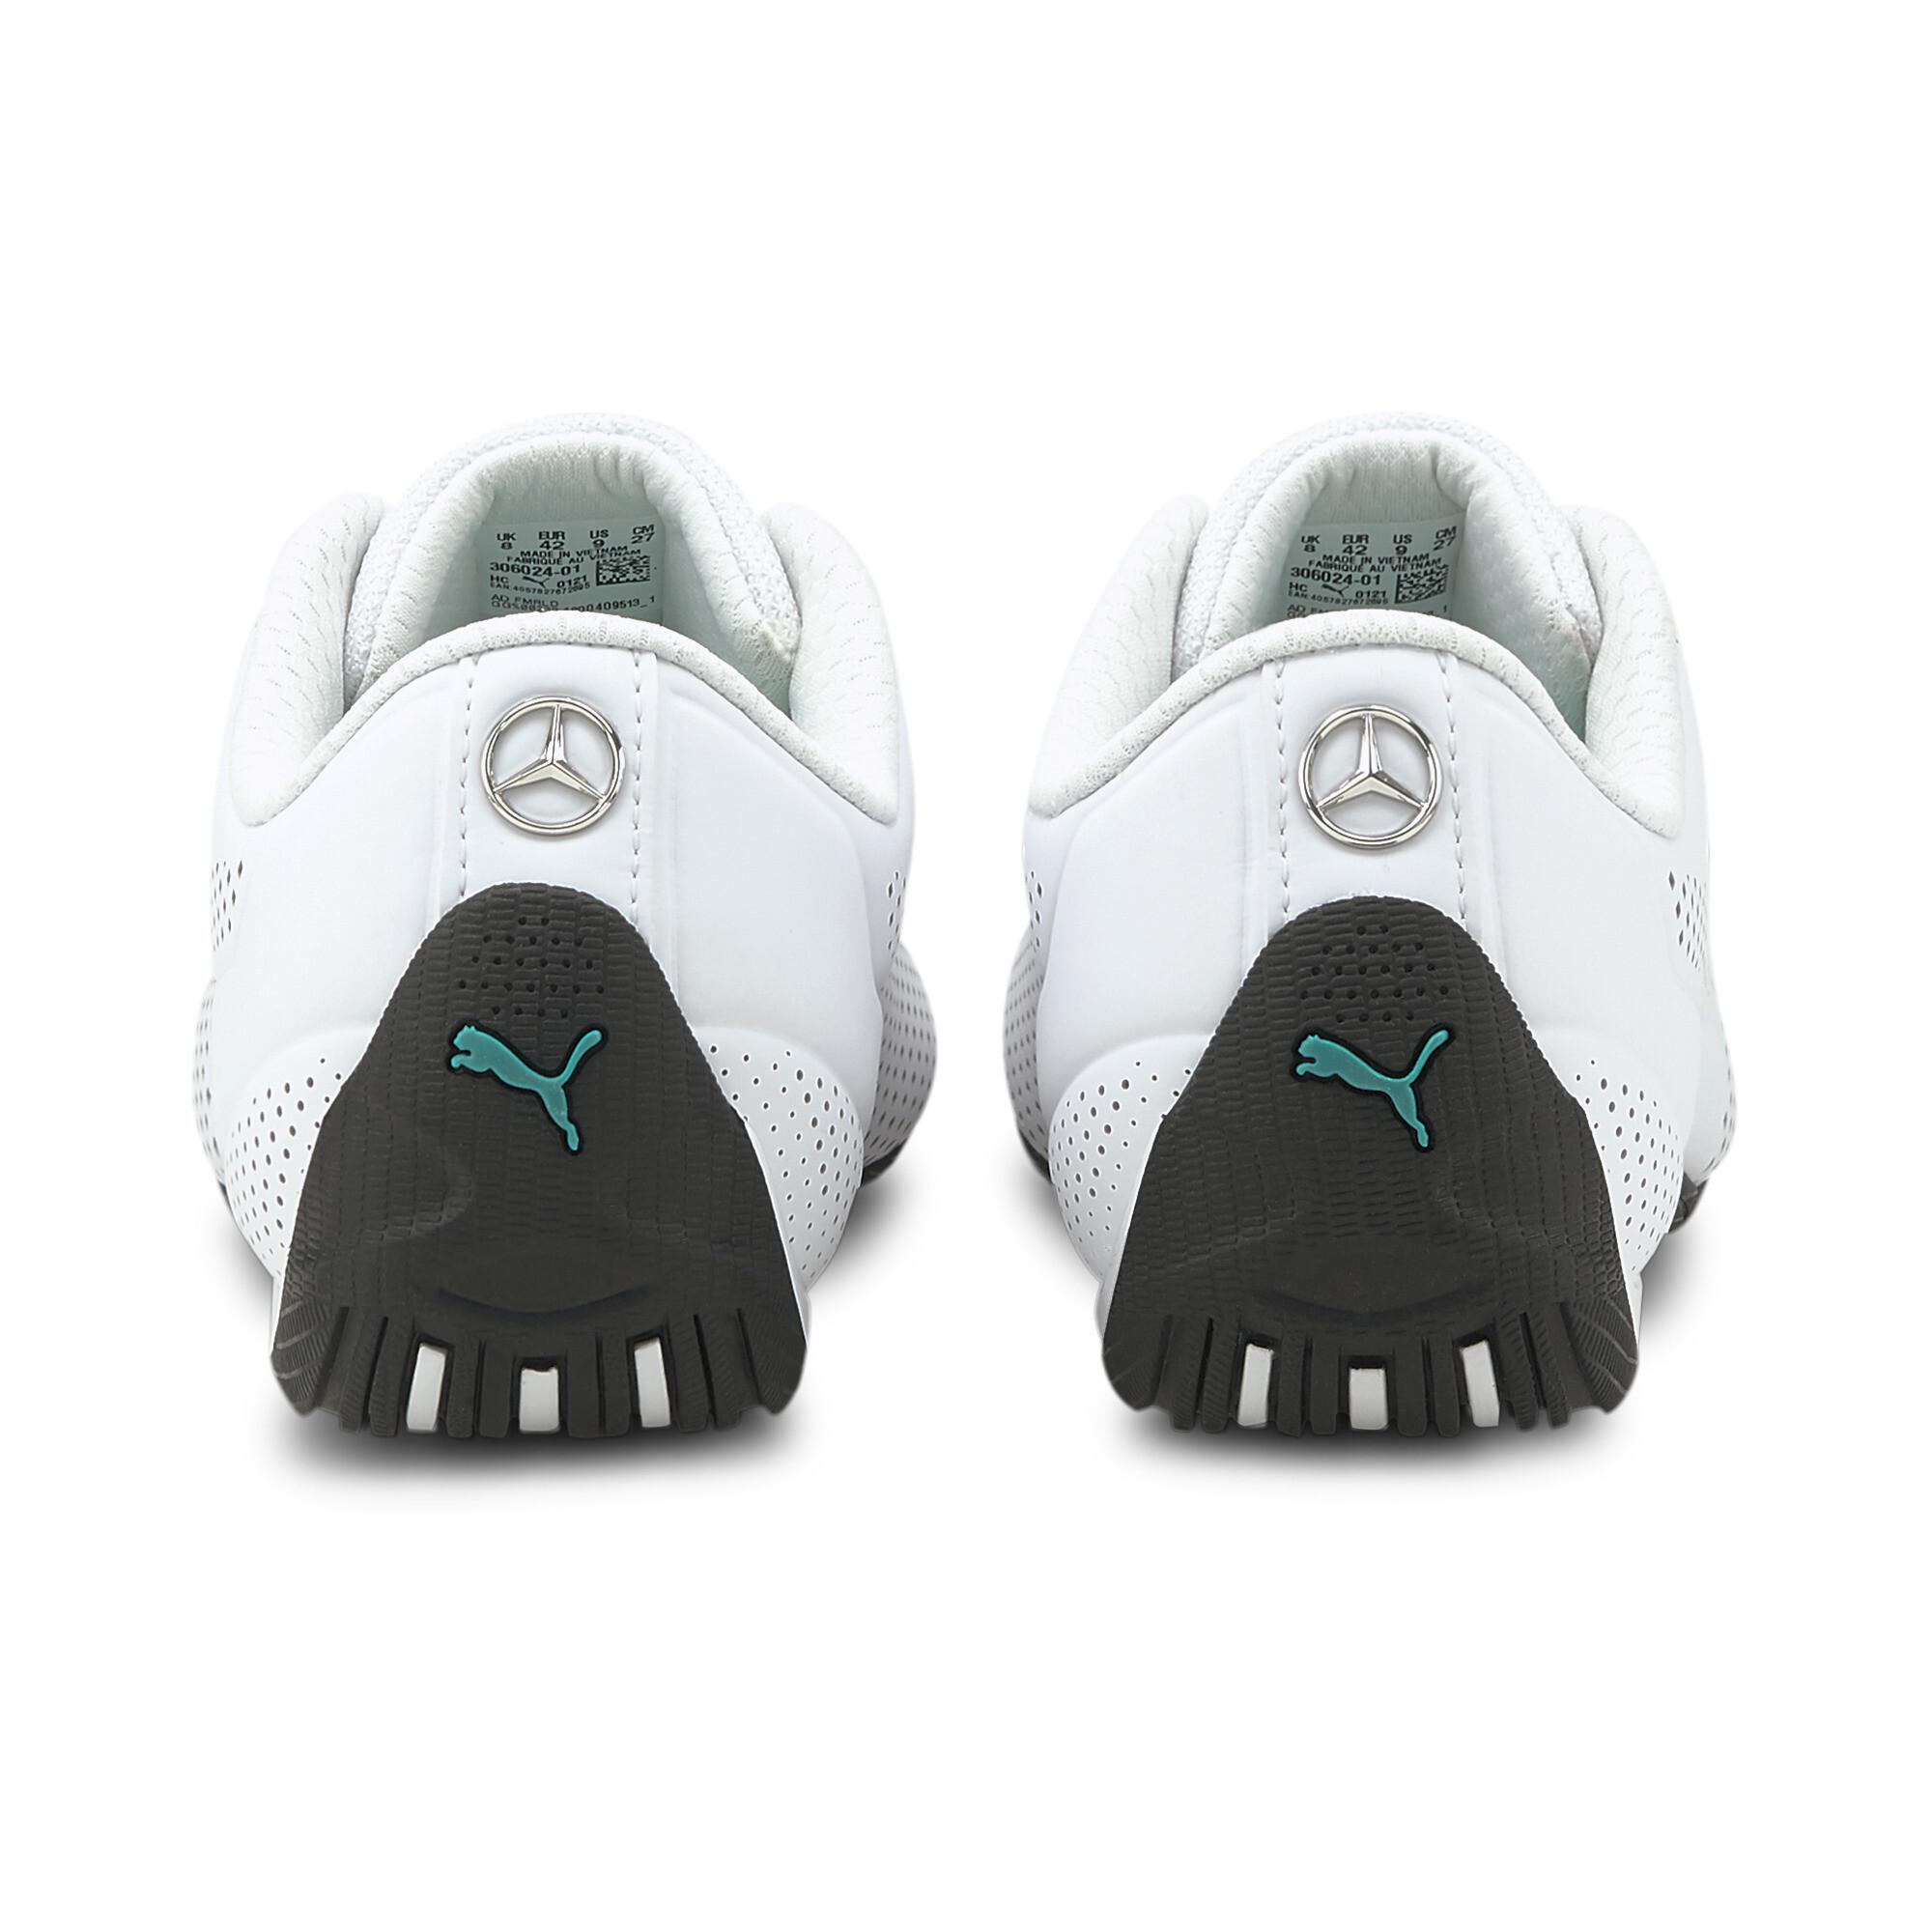 PUMA-MERCEDES-AMG-PETRONAS-Drift-Cat-Ultra-Sneaker-Unisex-Schuhe-Neu Indexbild 13